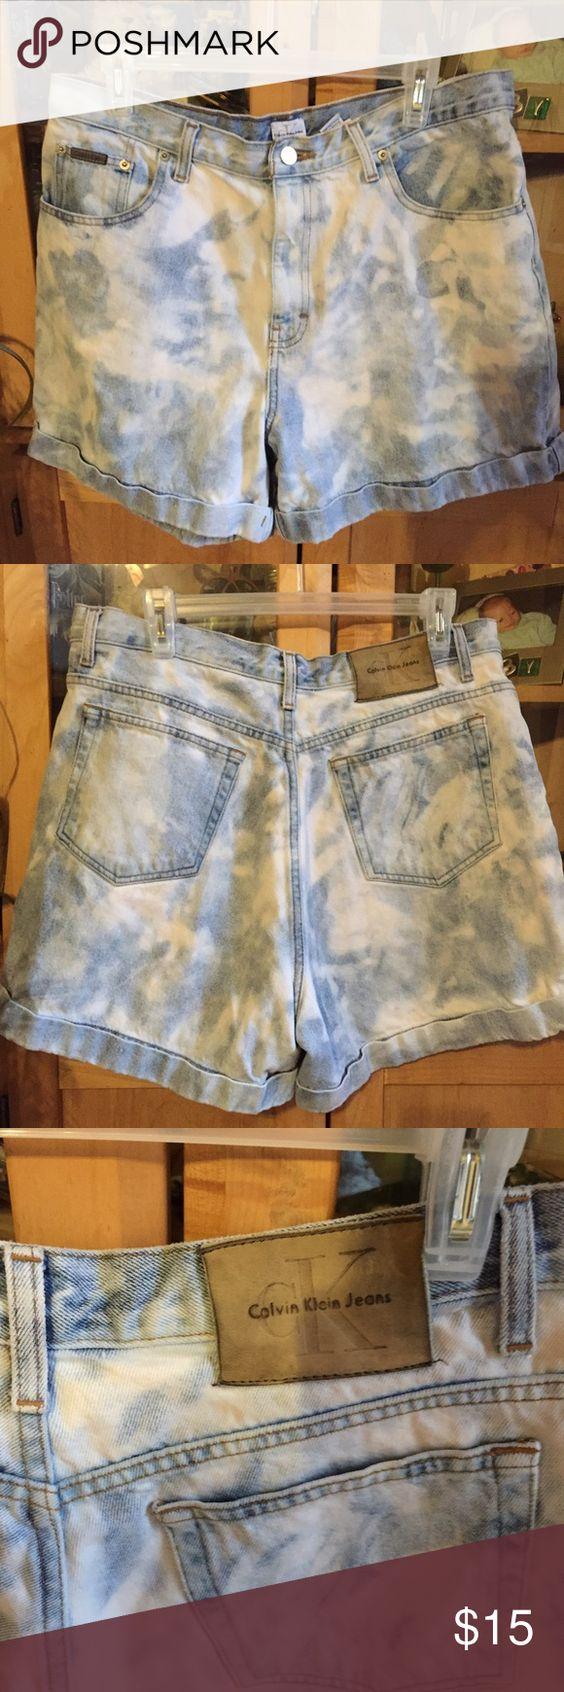 Vintage Calvin Klein jeans shorts Great condition.  Vintage Calvin Klein double stone wash denim shorts. Calvin Klein Jeans Shorts Jean Shorts